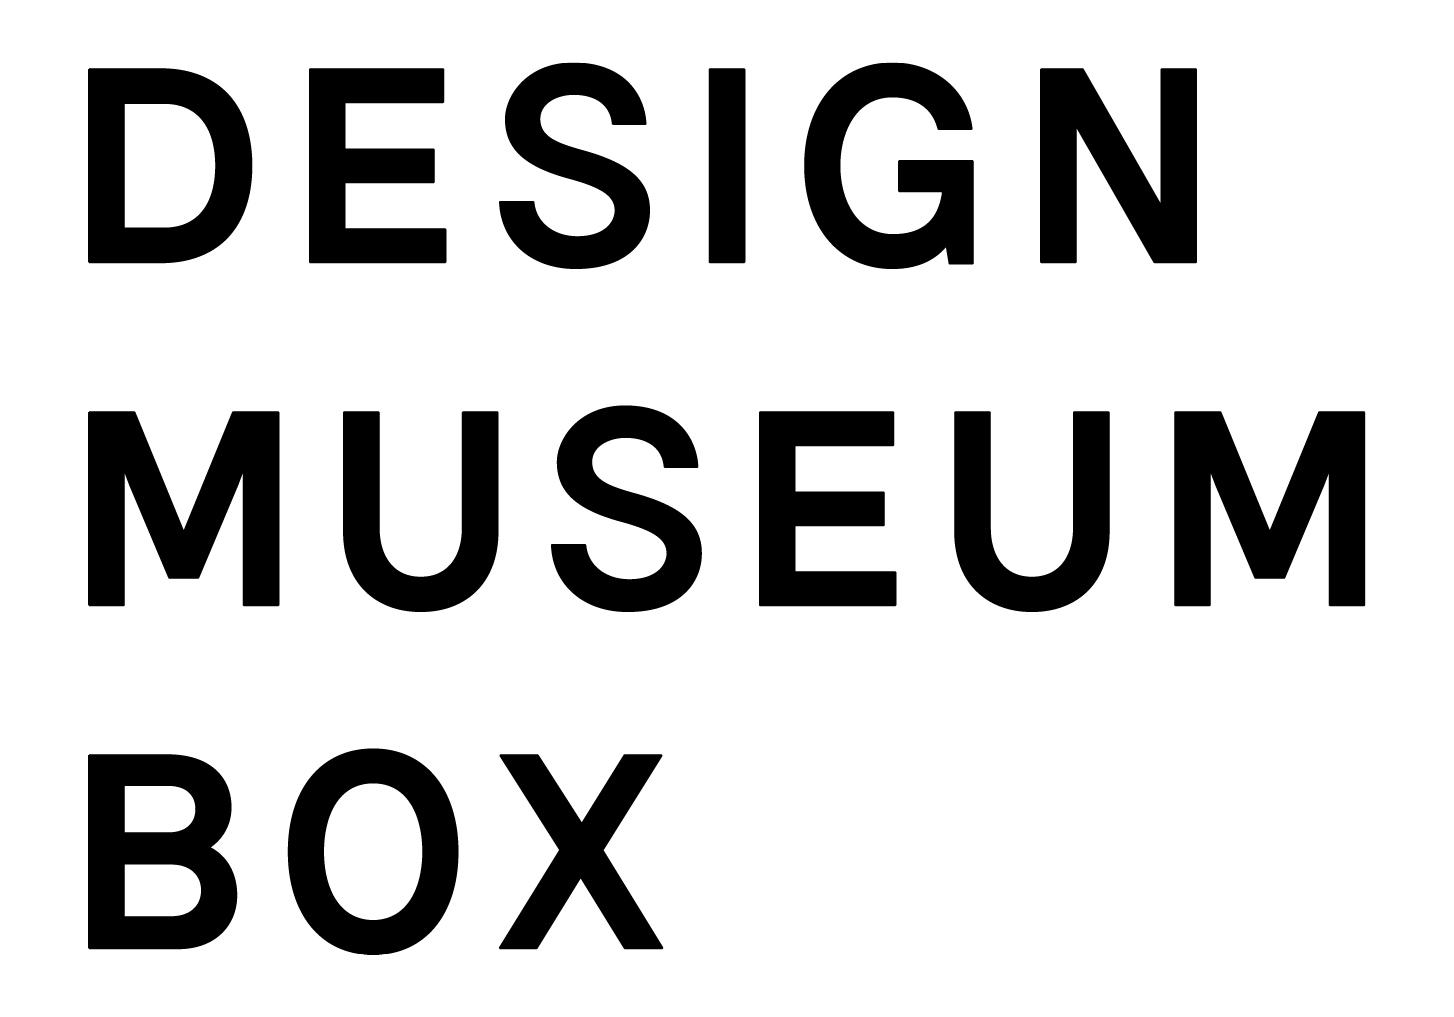 DESIGN MUSEUM BOX 「柳宗理のデザインプロセス カトラリーを例に」